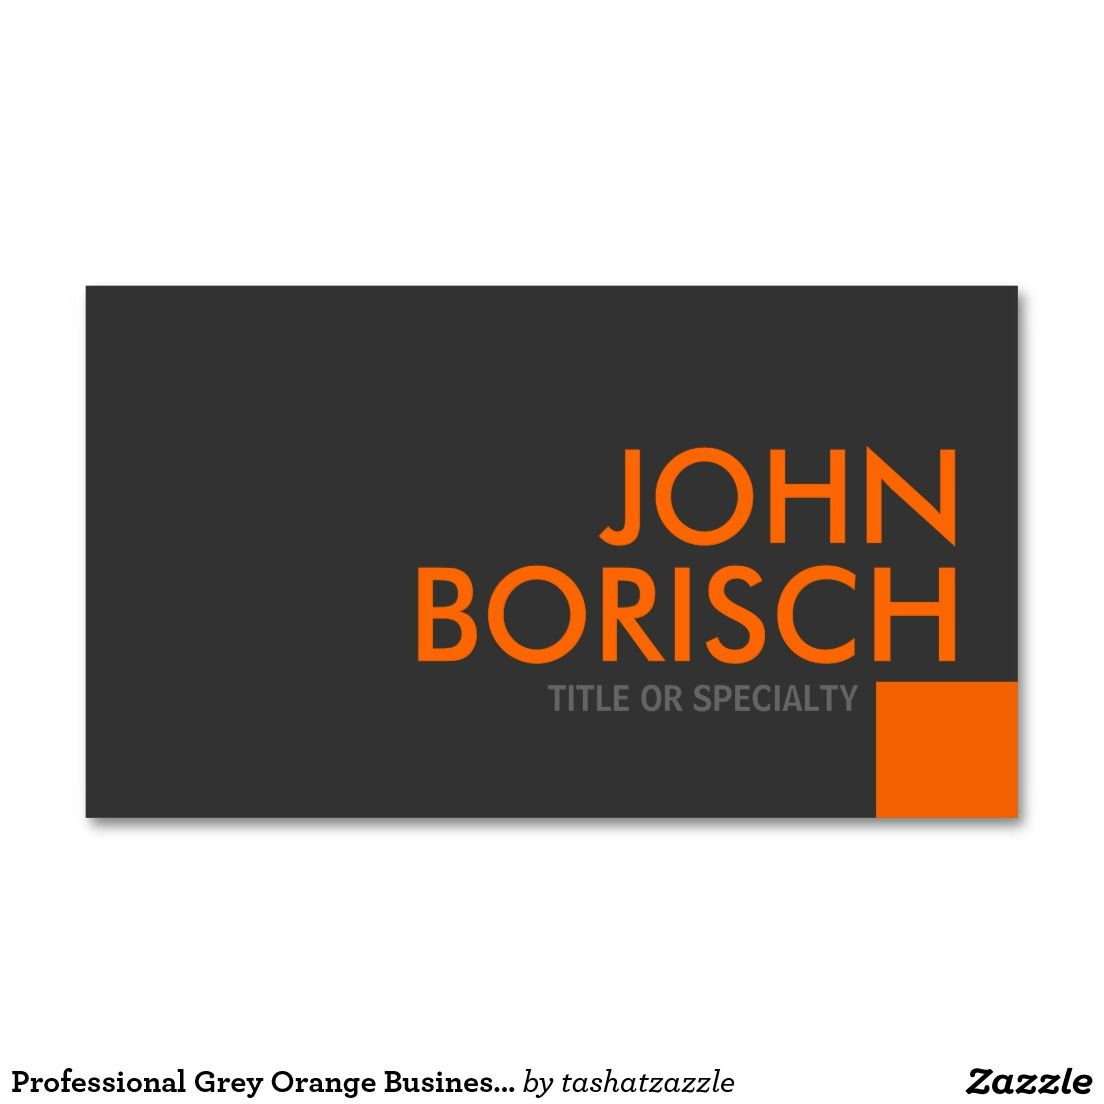 Professional Grey Orange Business Profile Card | Pinterest ...